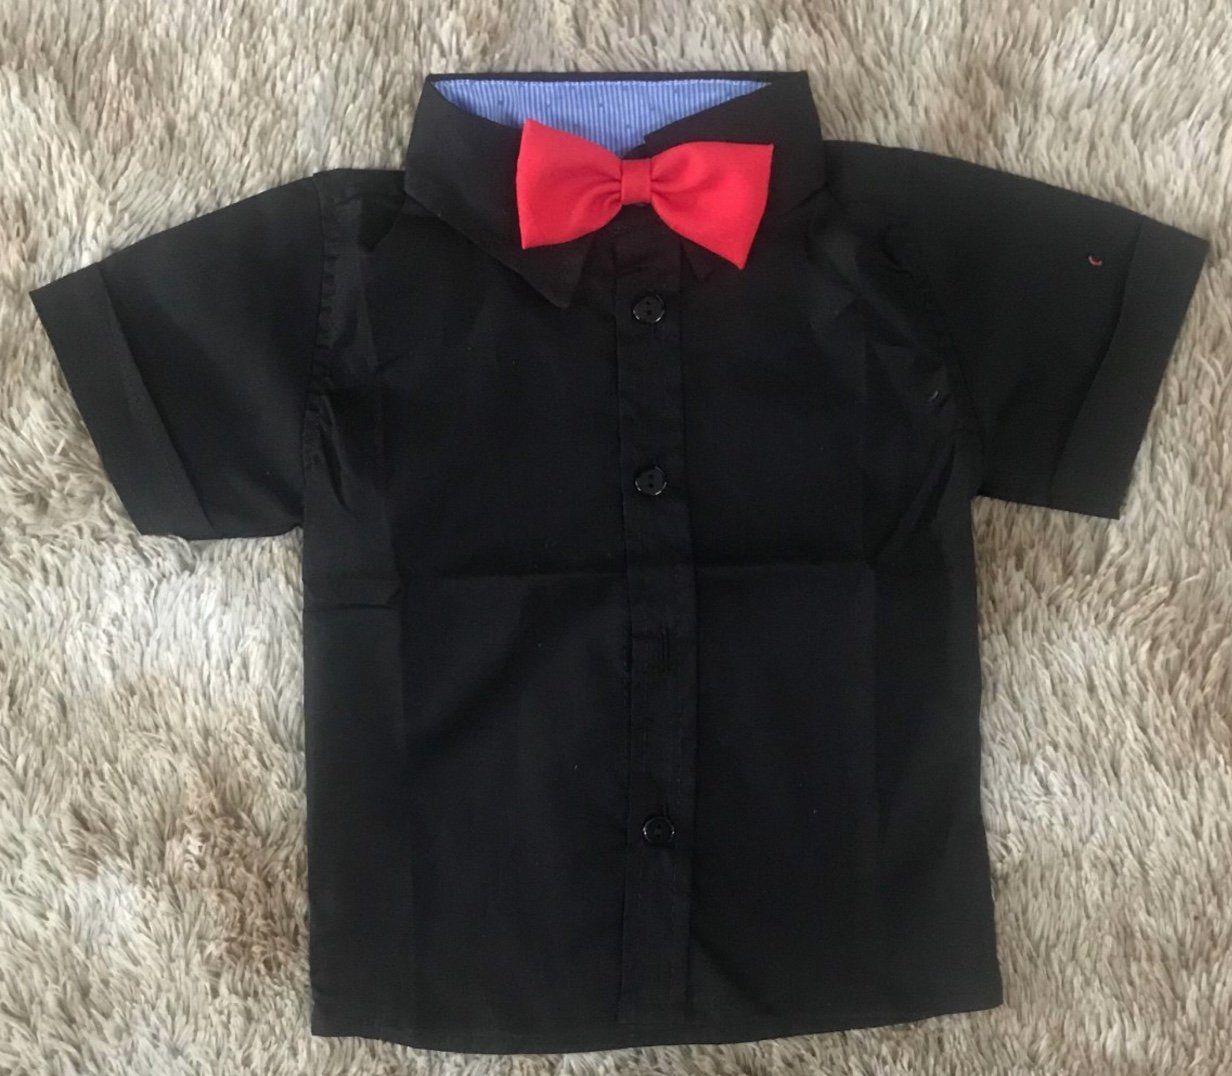 Camisa Preto com Gravata Borboleta